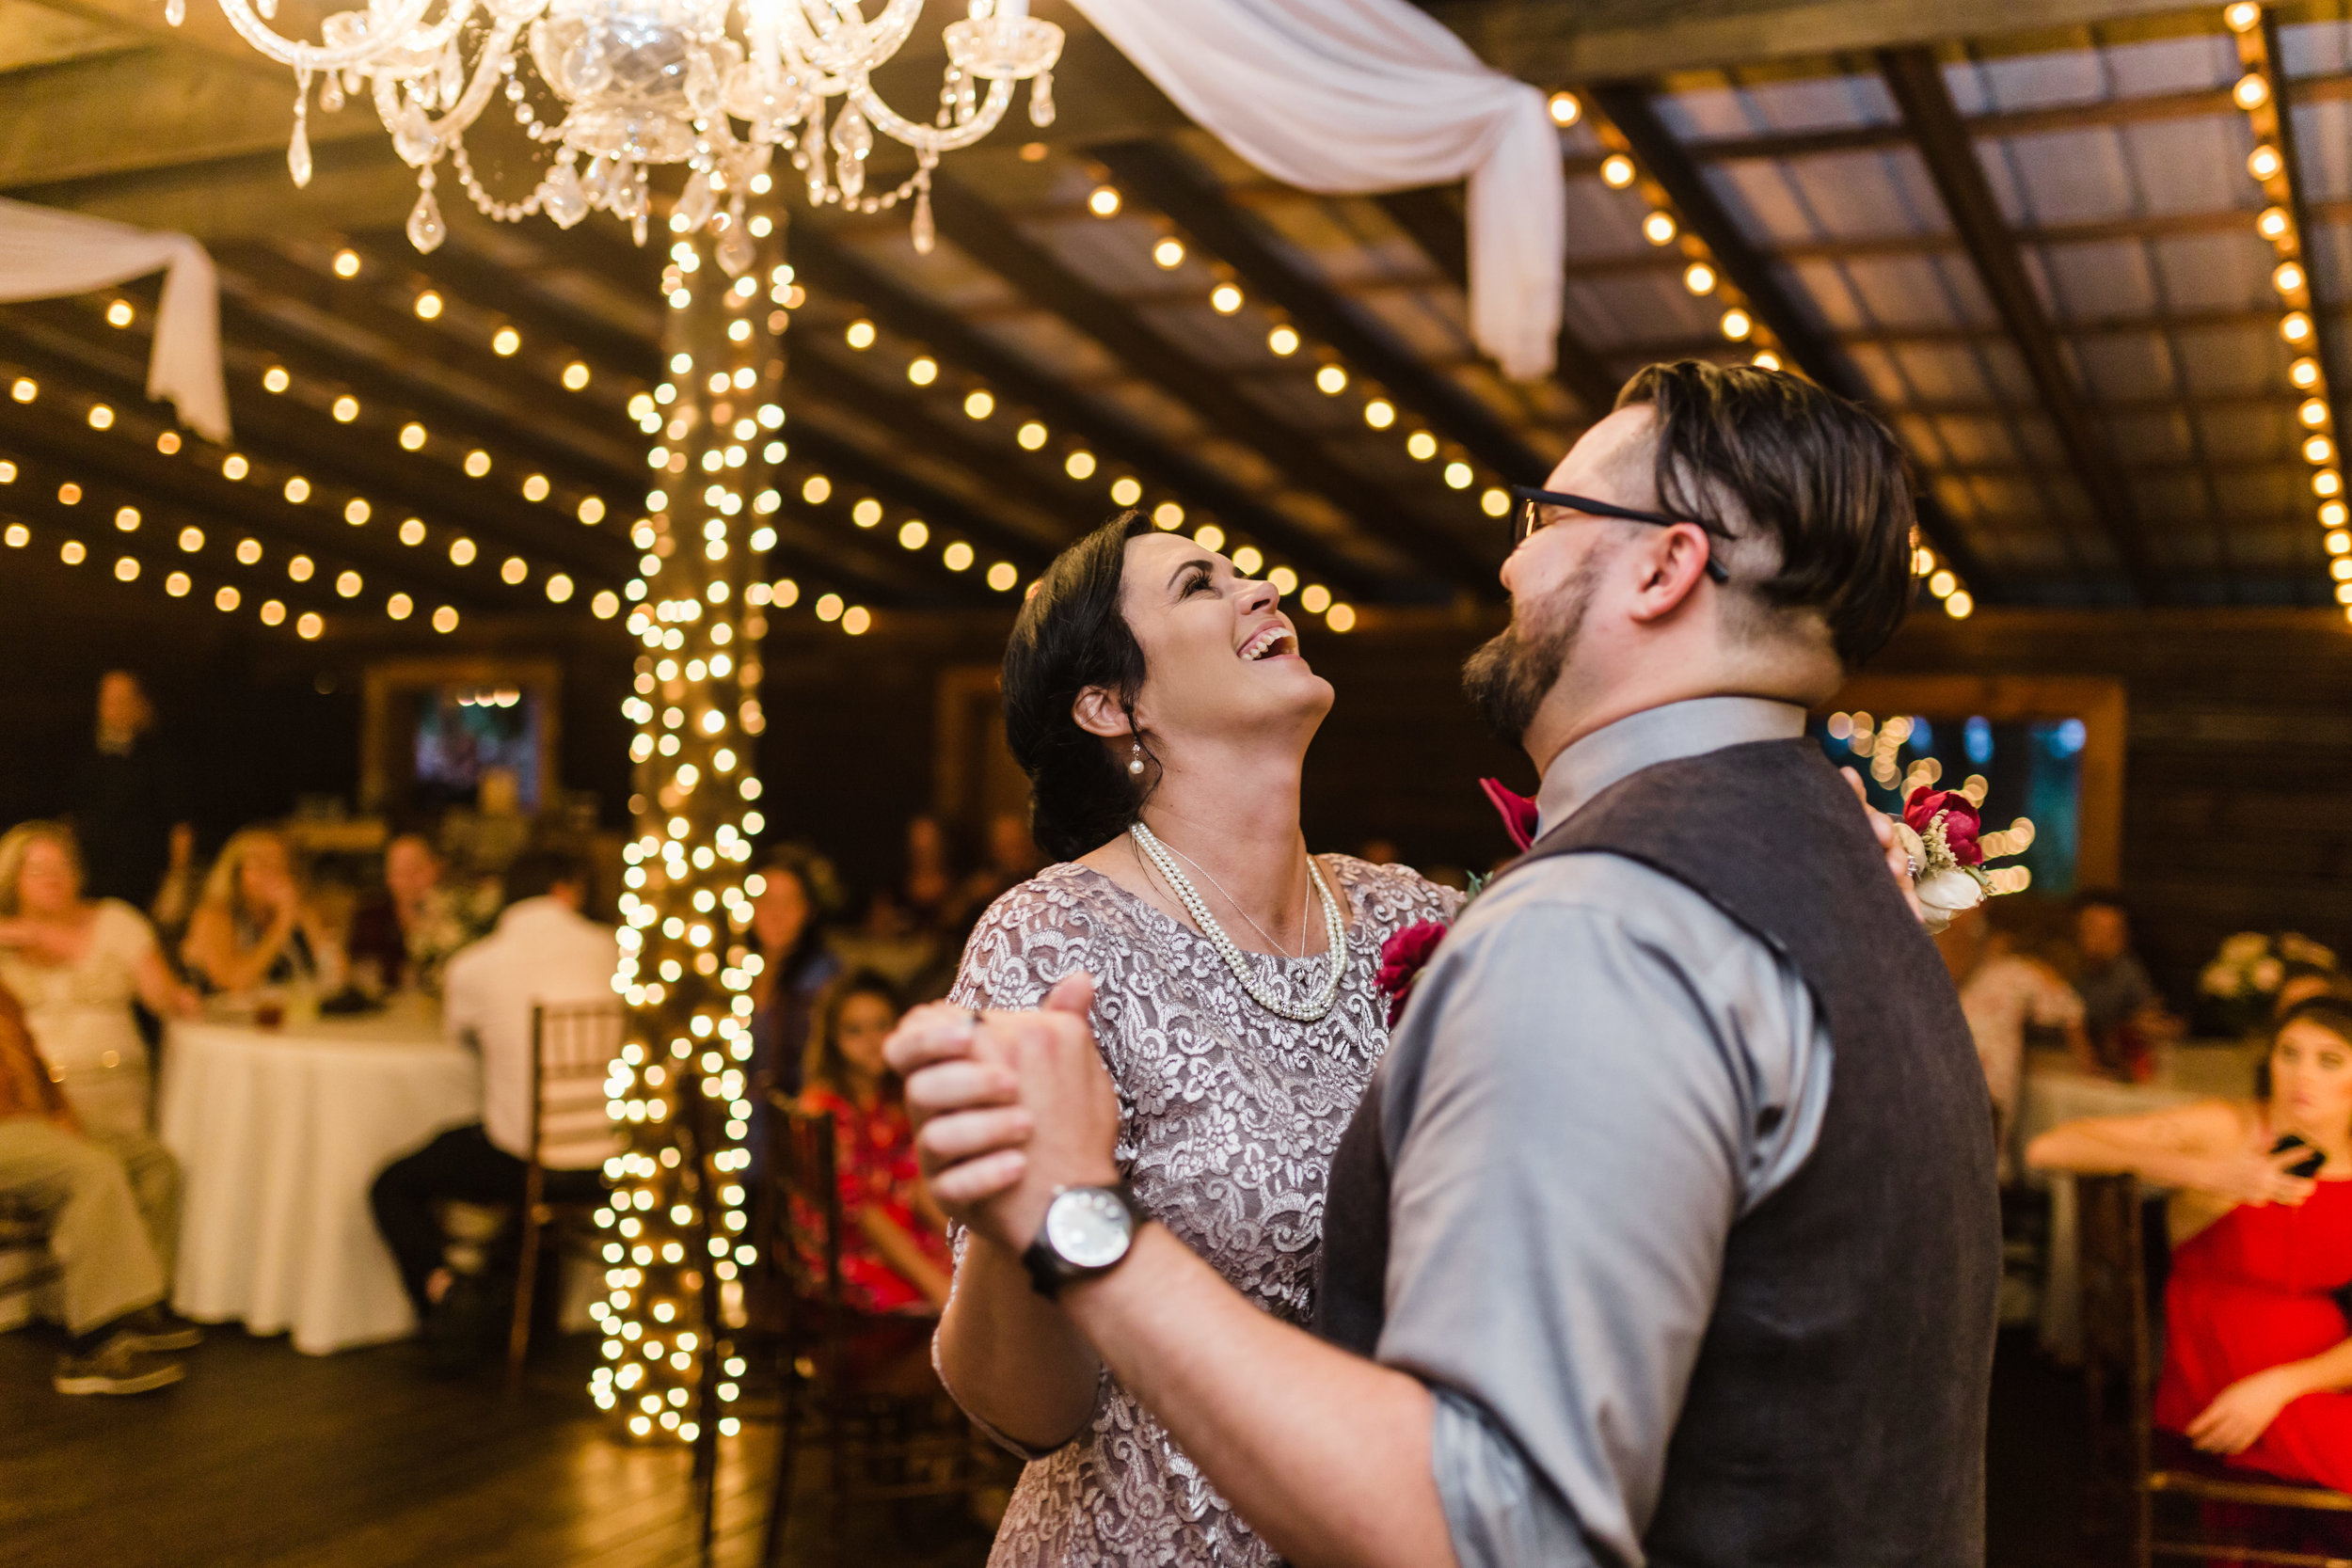 2018.11.11 Paige and TJ Enchanting Barn Wedding (585 of 841).jpg